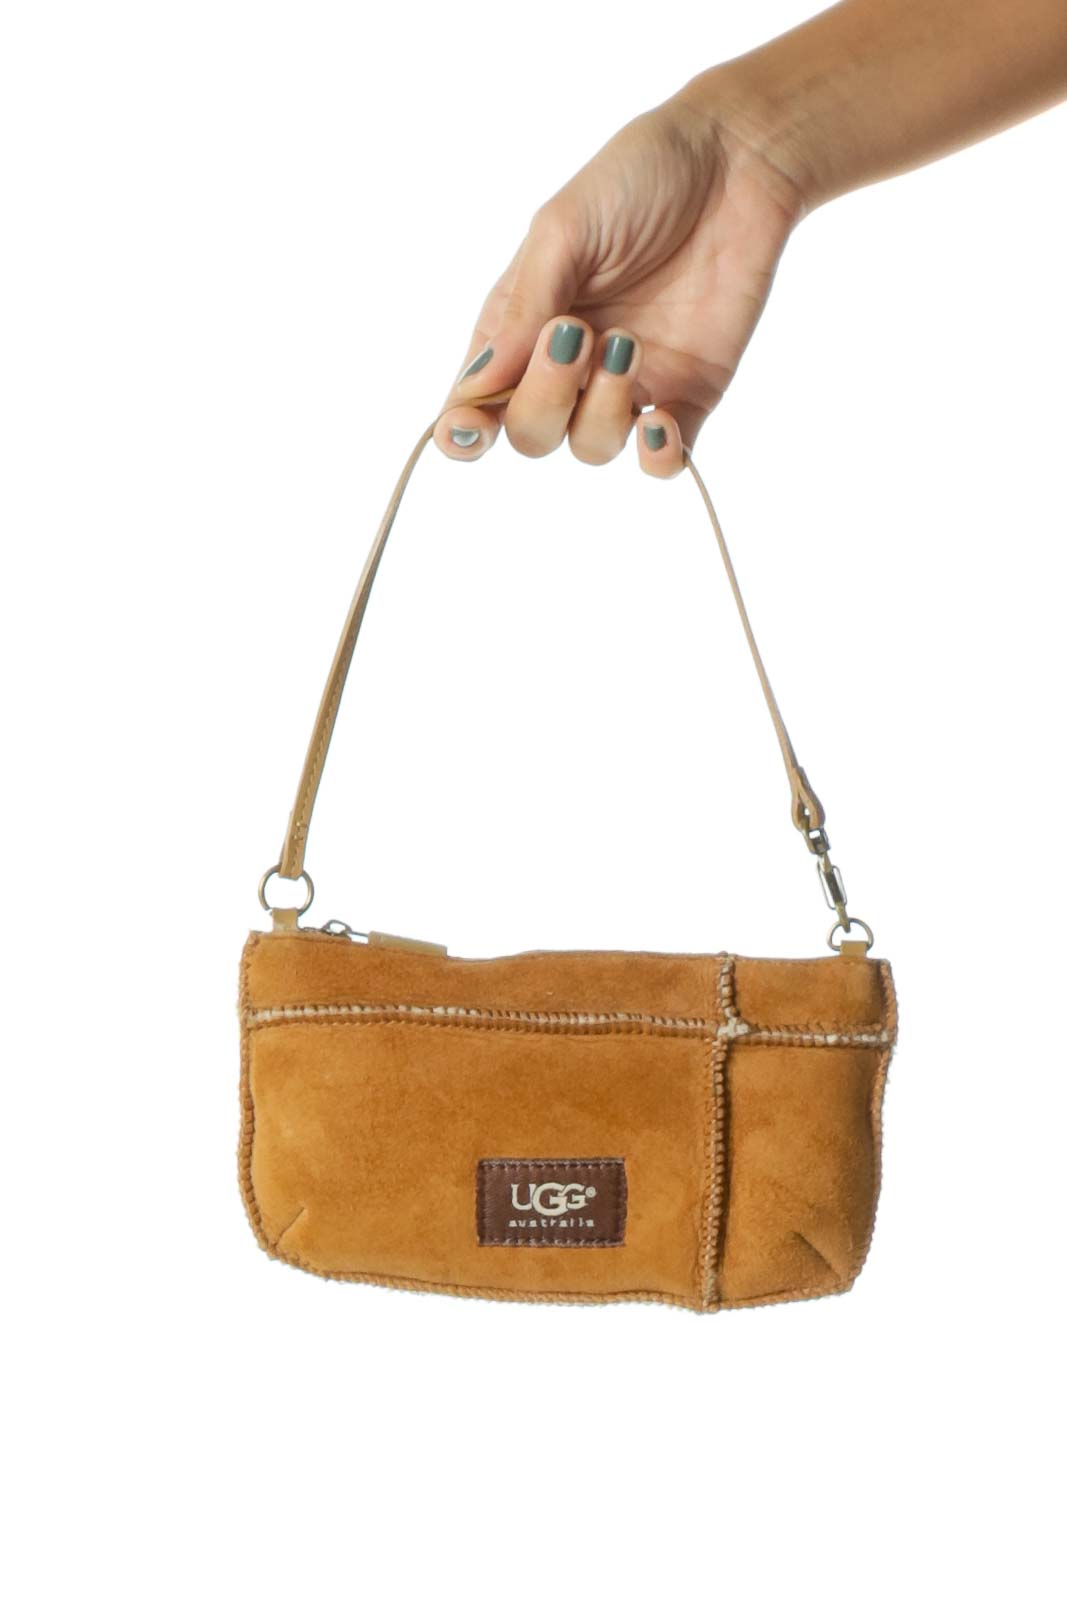 Brown Shearling Inside Adjustable Strap (Handle or Wristlet) Zippered Small Bag